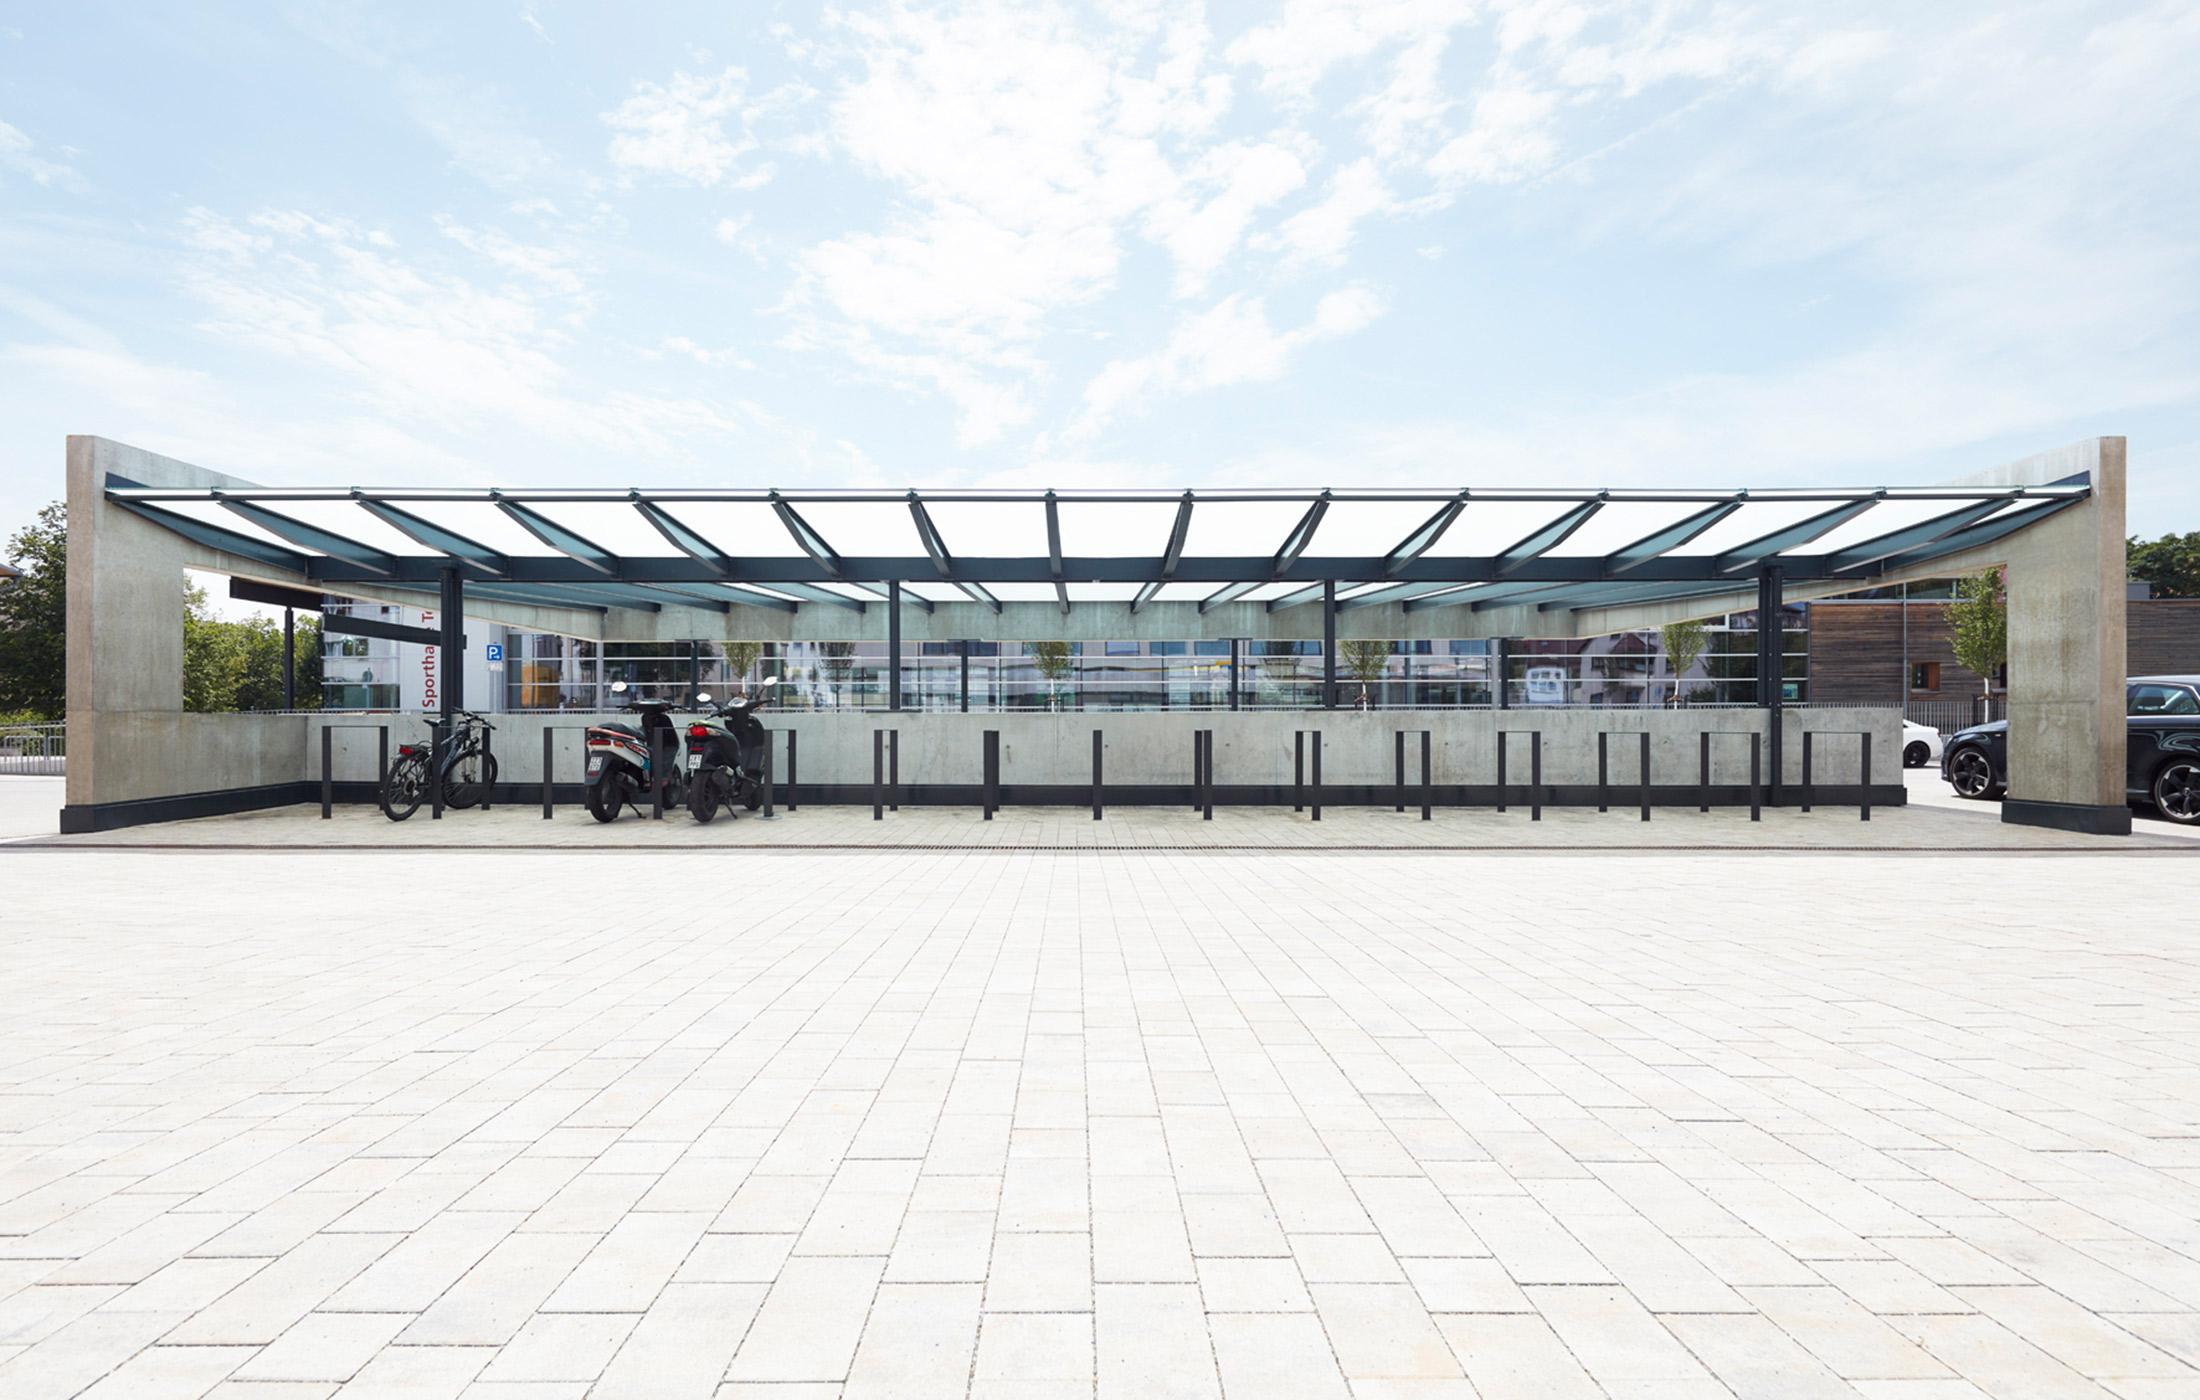 2017, Neubau Koroneo, Korntal - Münchingen